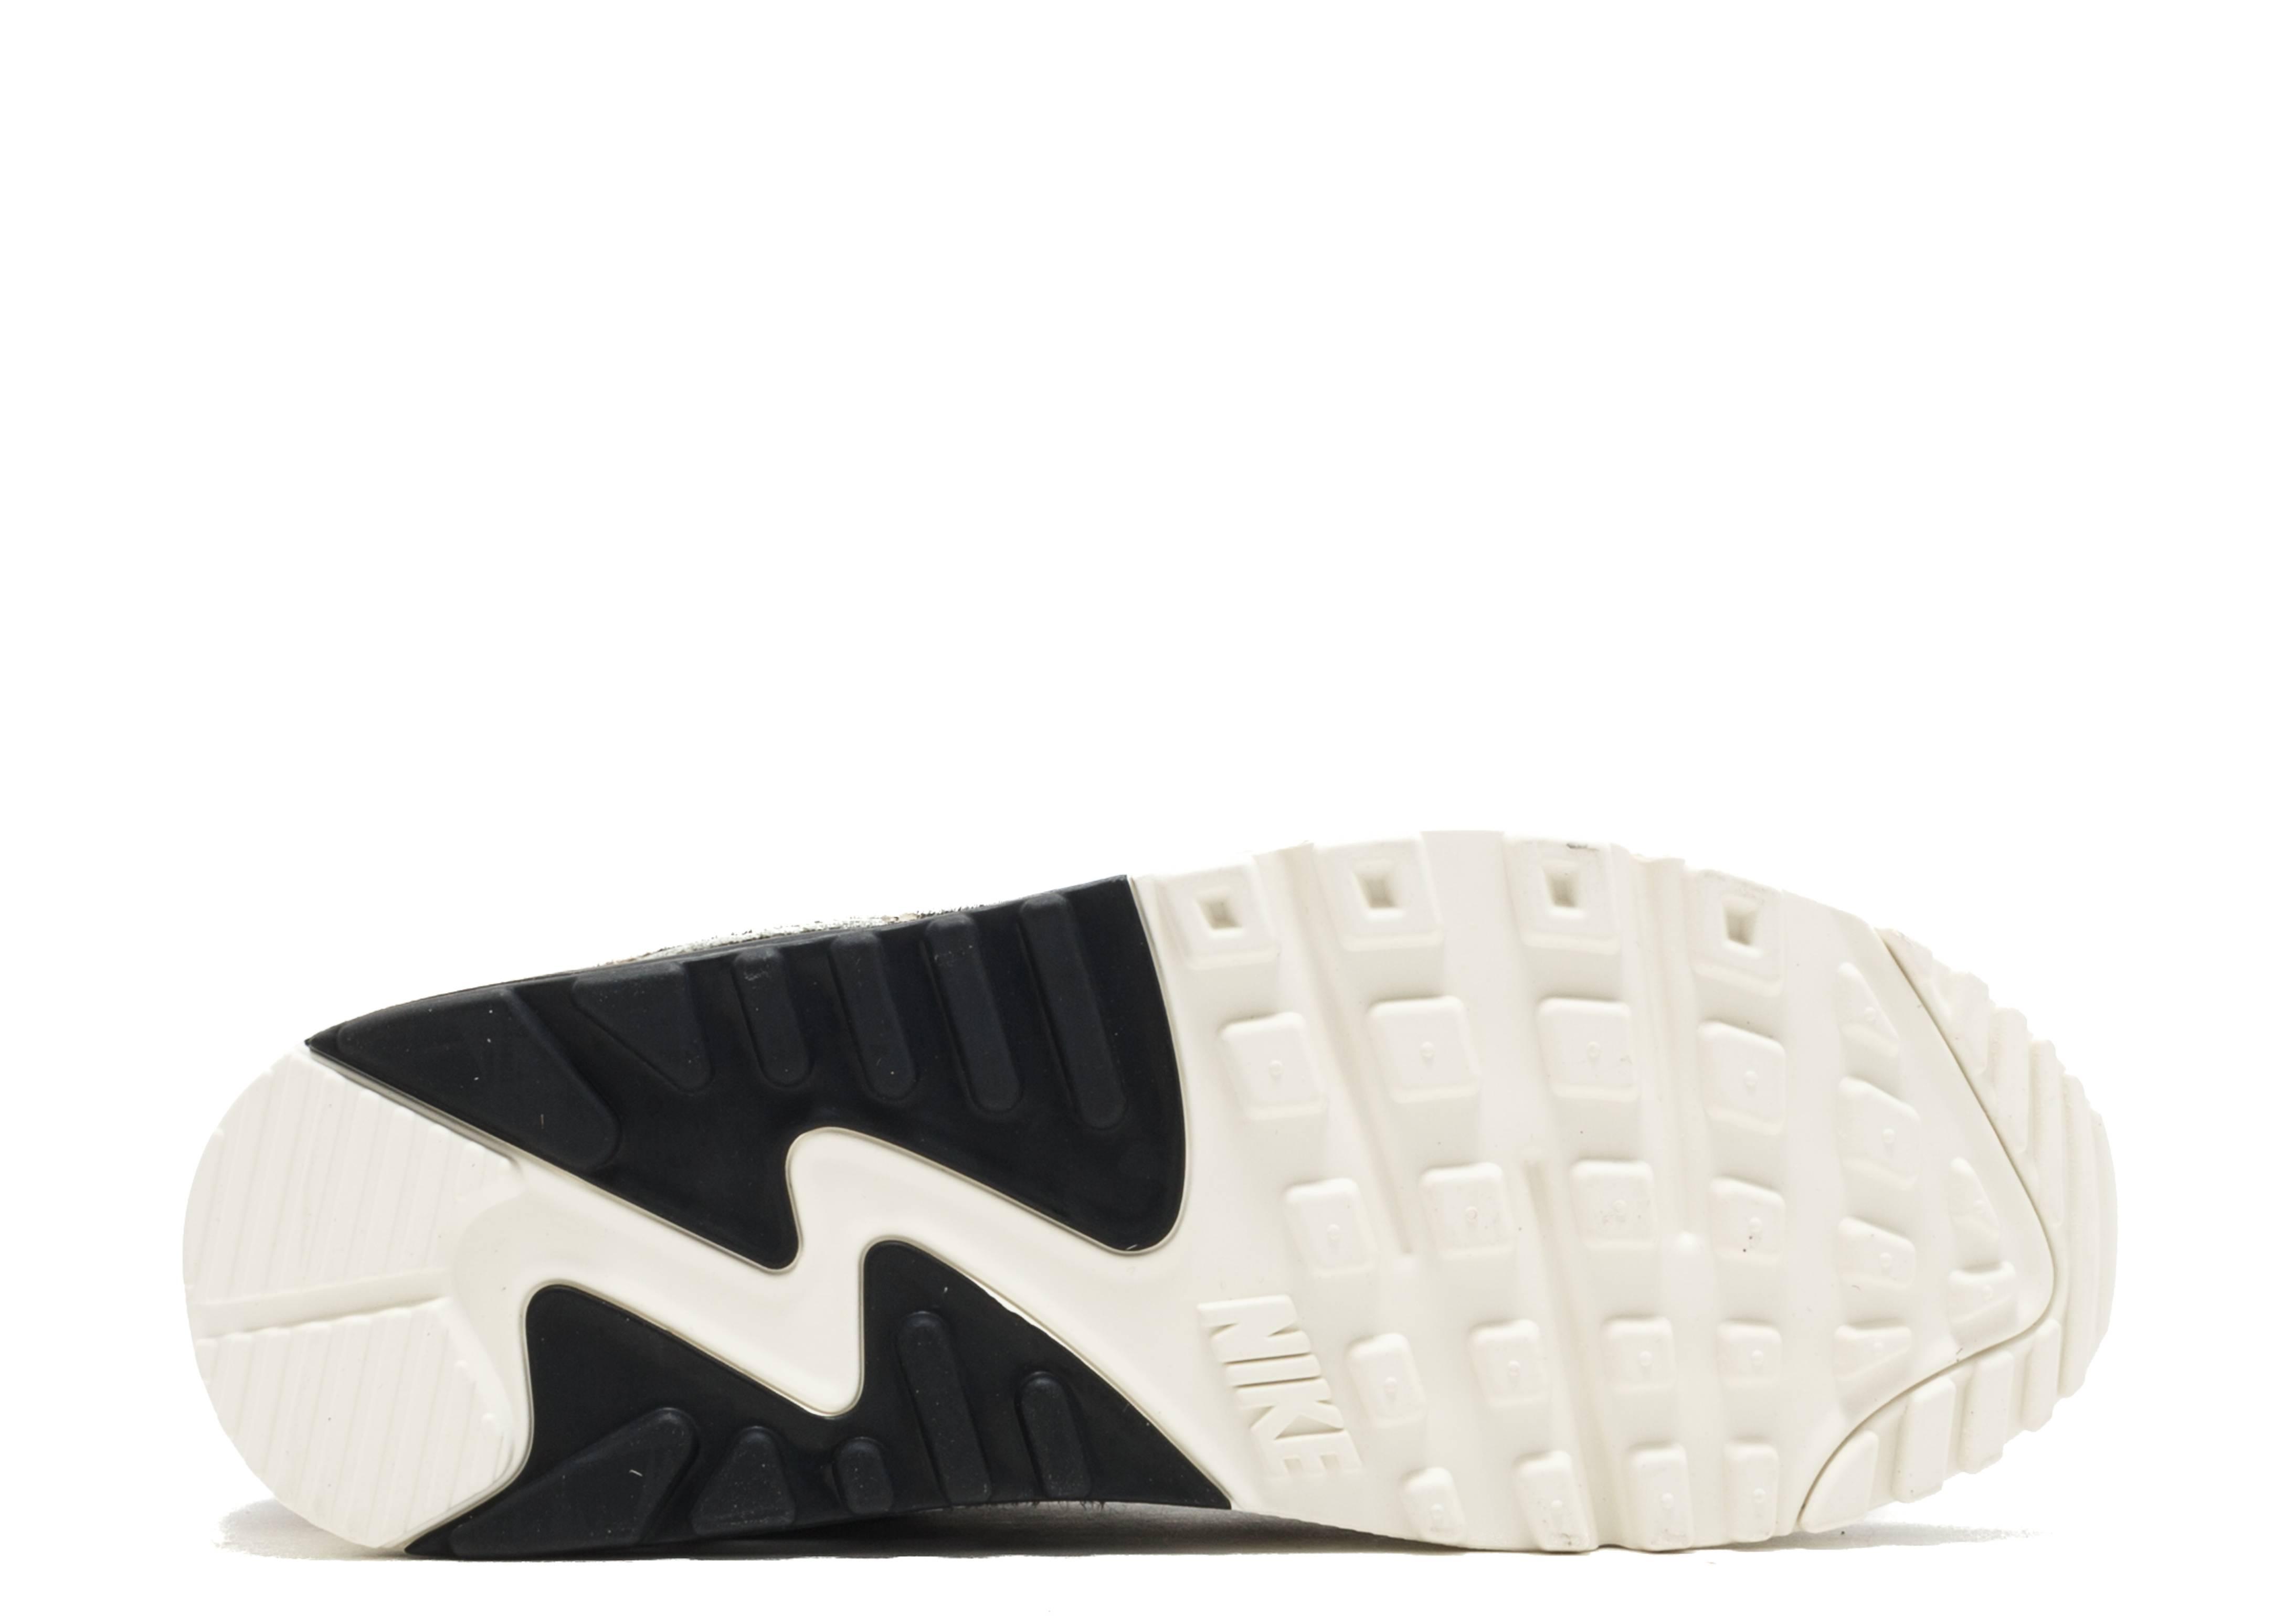 ee38cb2c631 Nike Wmns Air Max 90 Lx